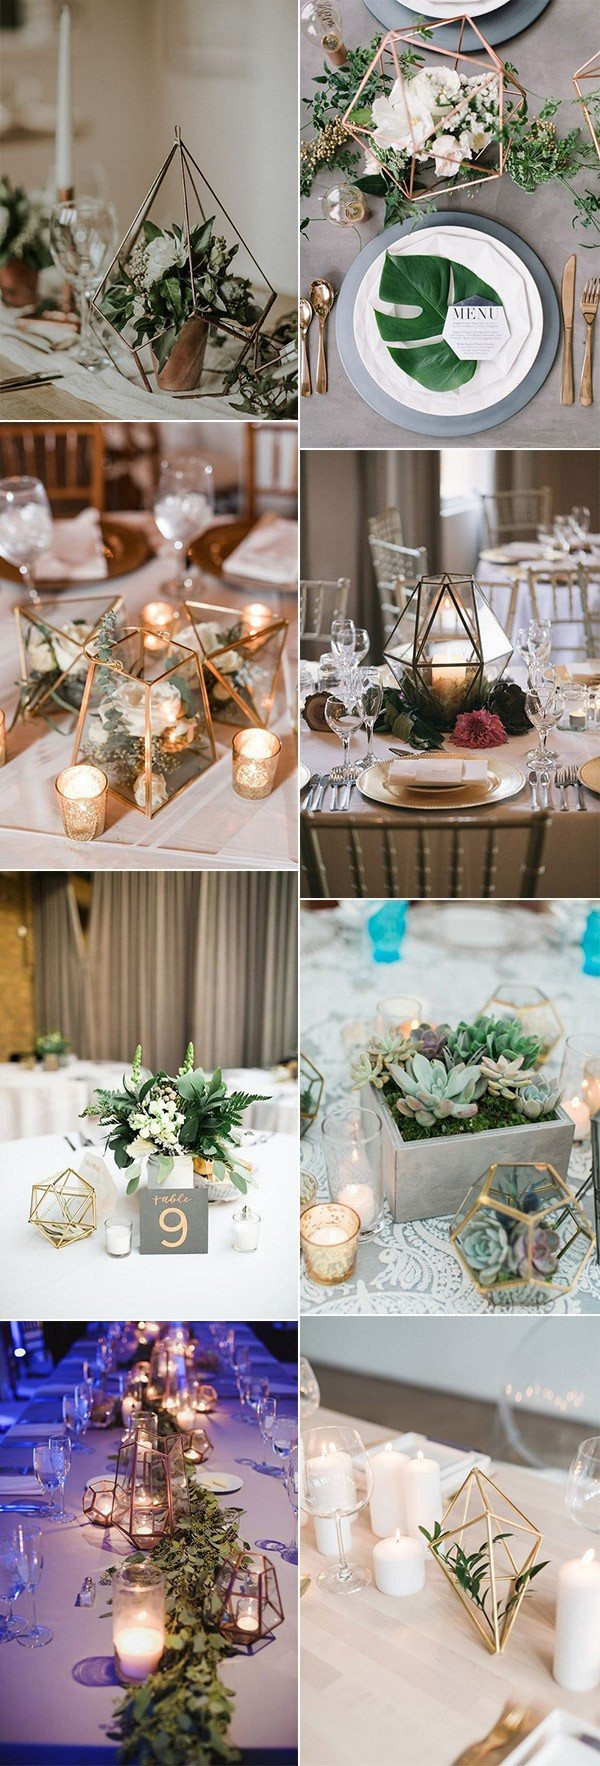 chic geometric wedding centerpiece ideas for 2018 trends